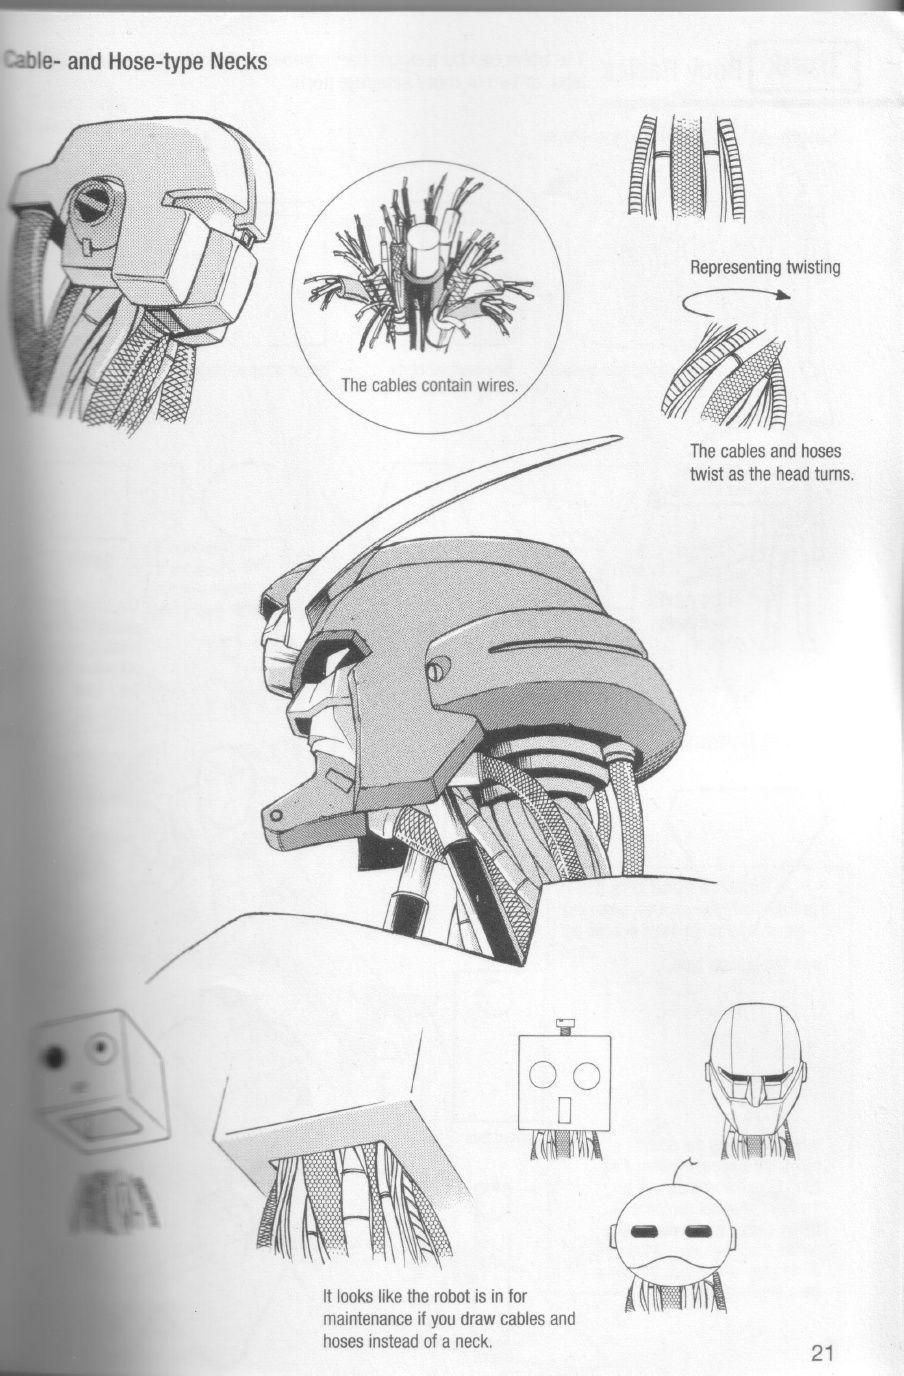 Como Desenhar Mangá - Robôs | Clang | Pinterest | Robot, Graffiti ...